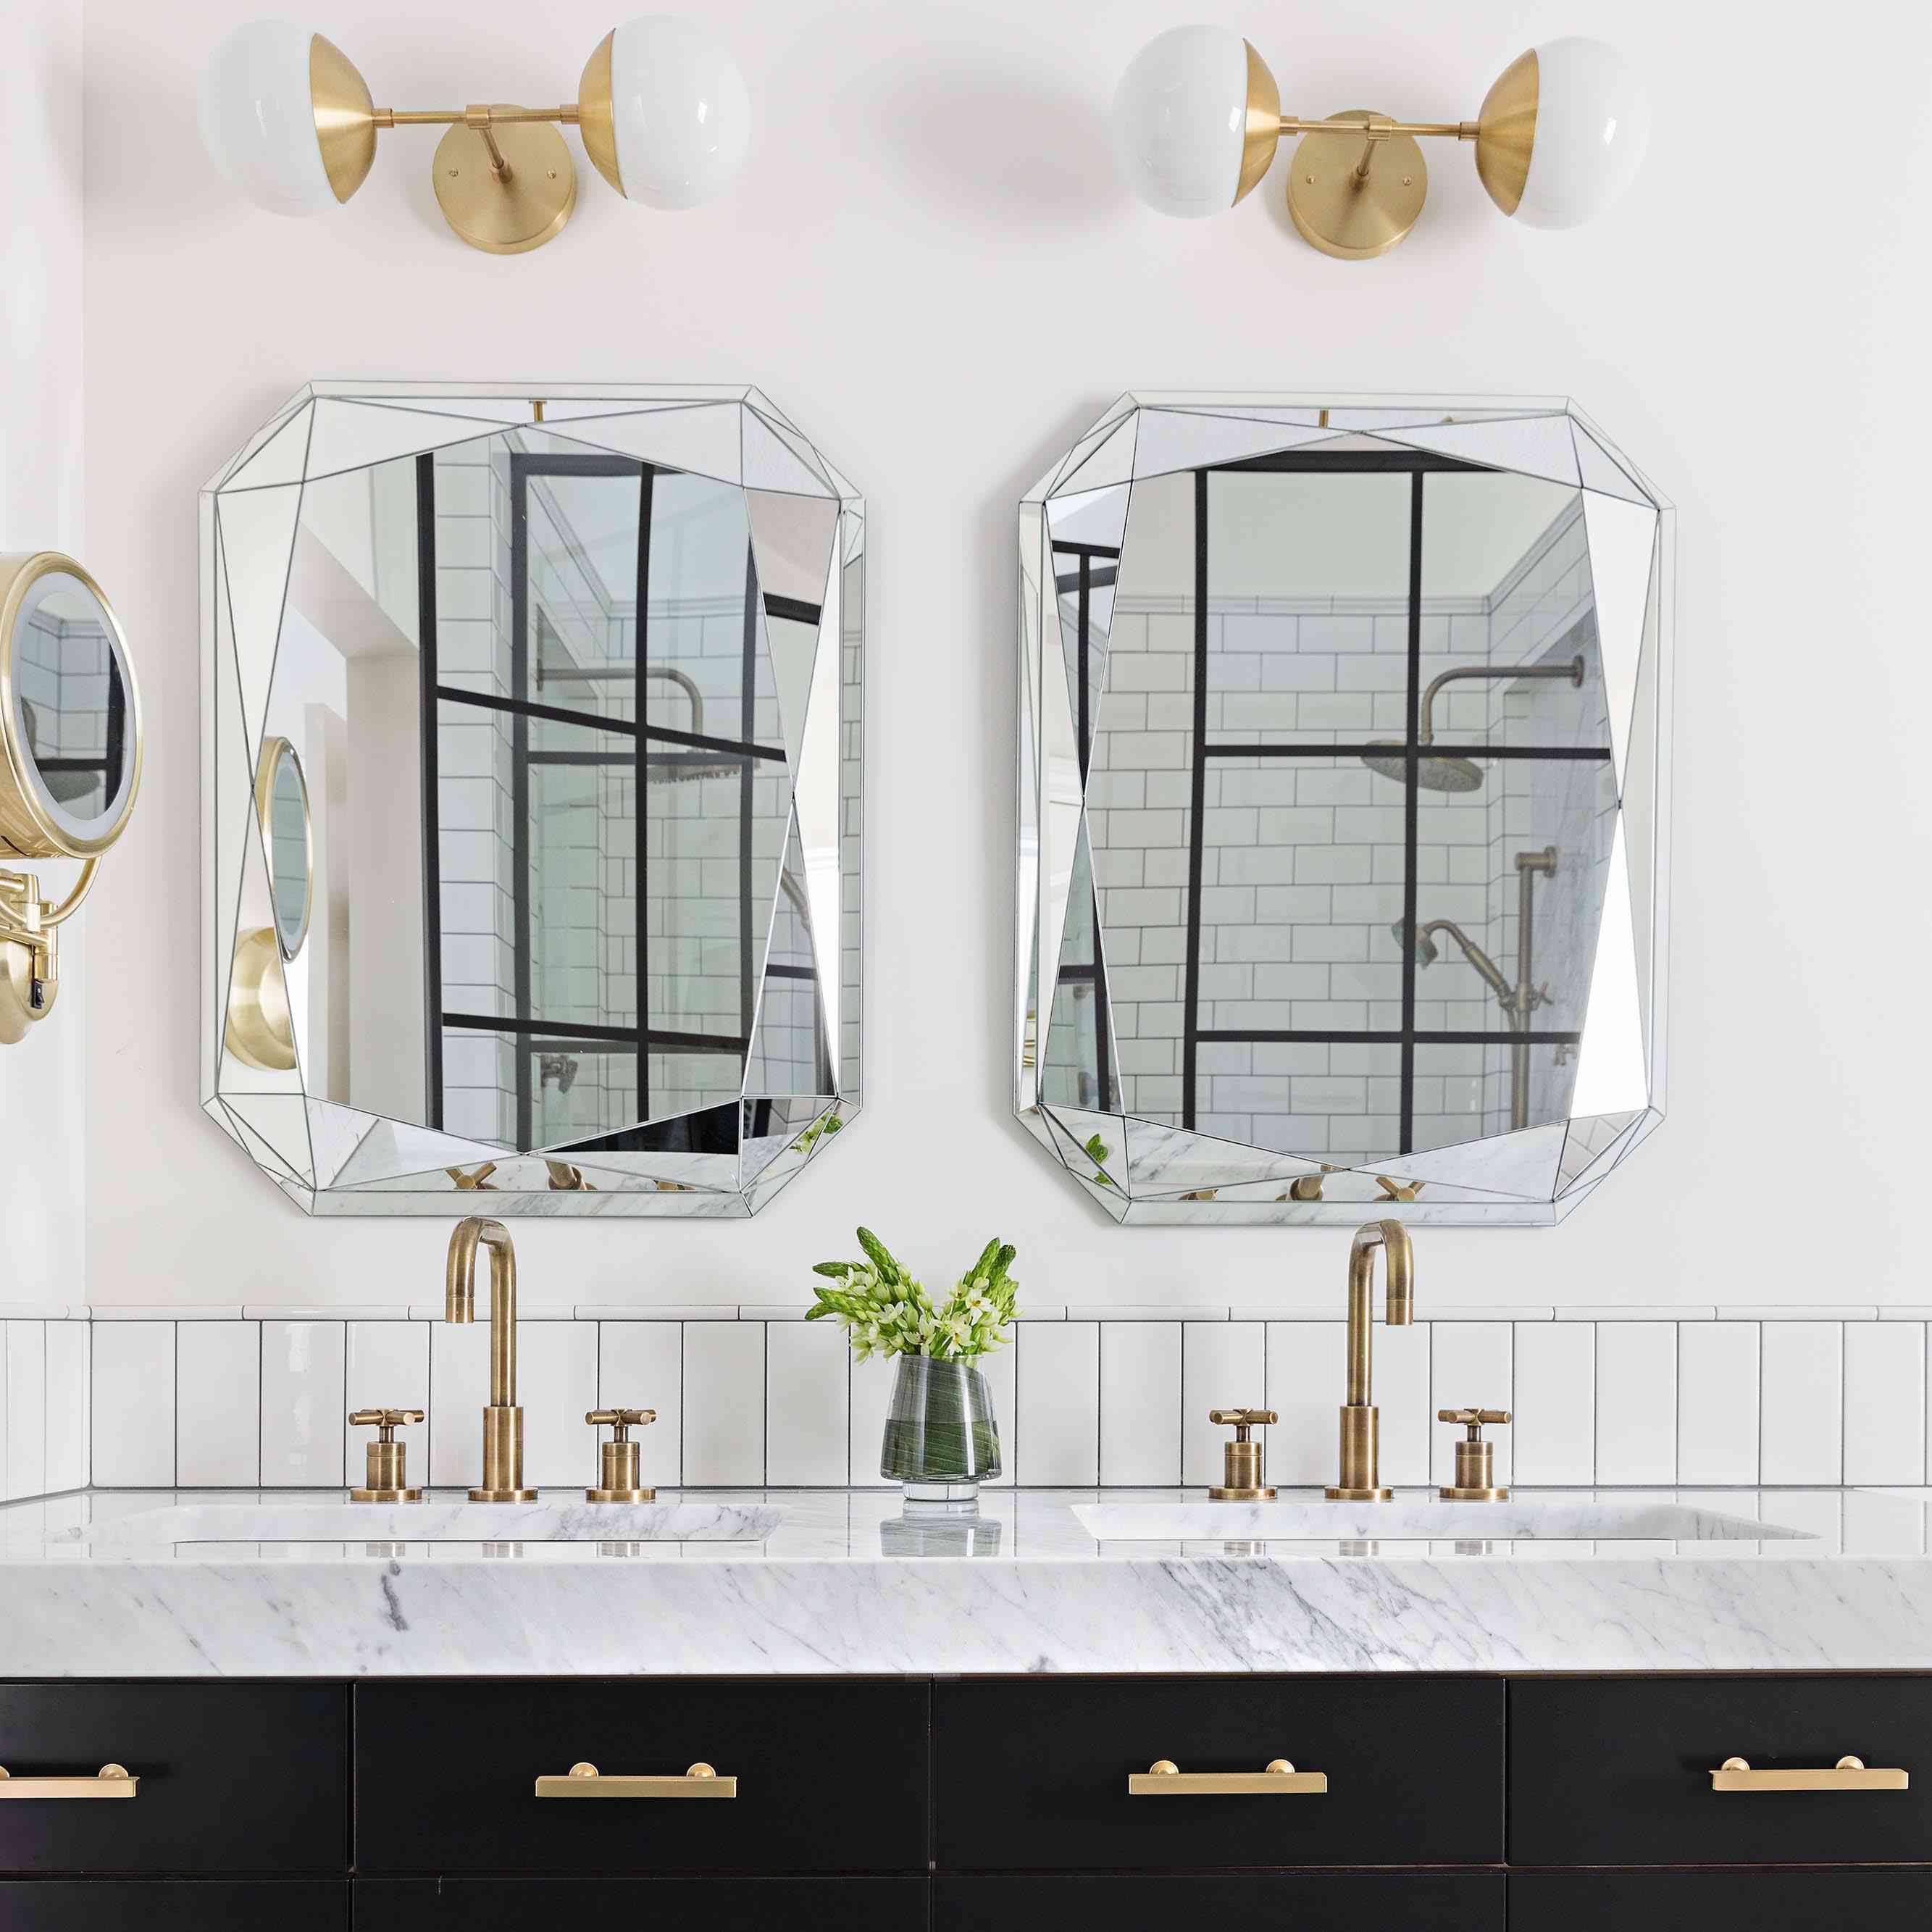 Gold and black bathroom vanity.